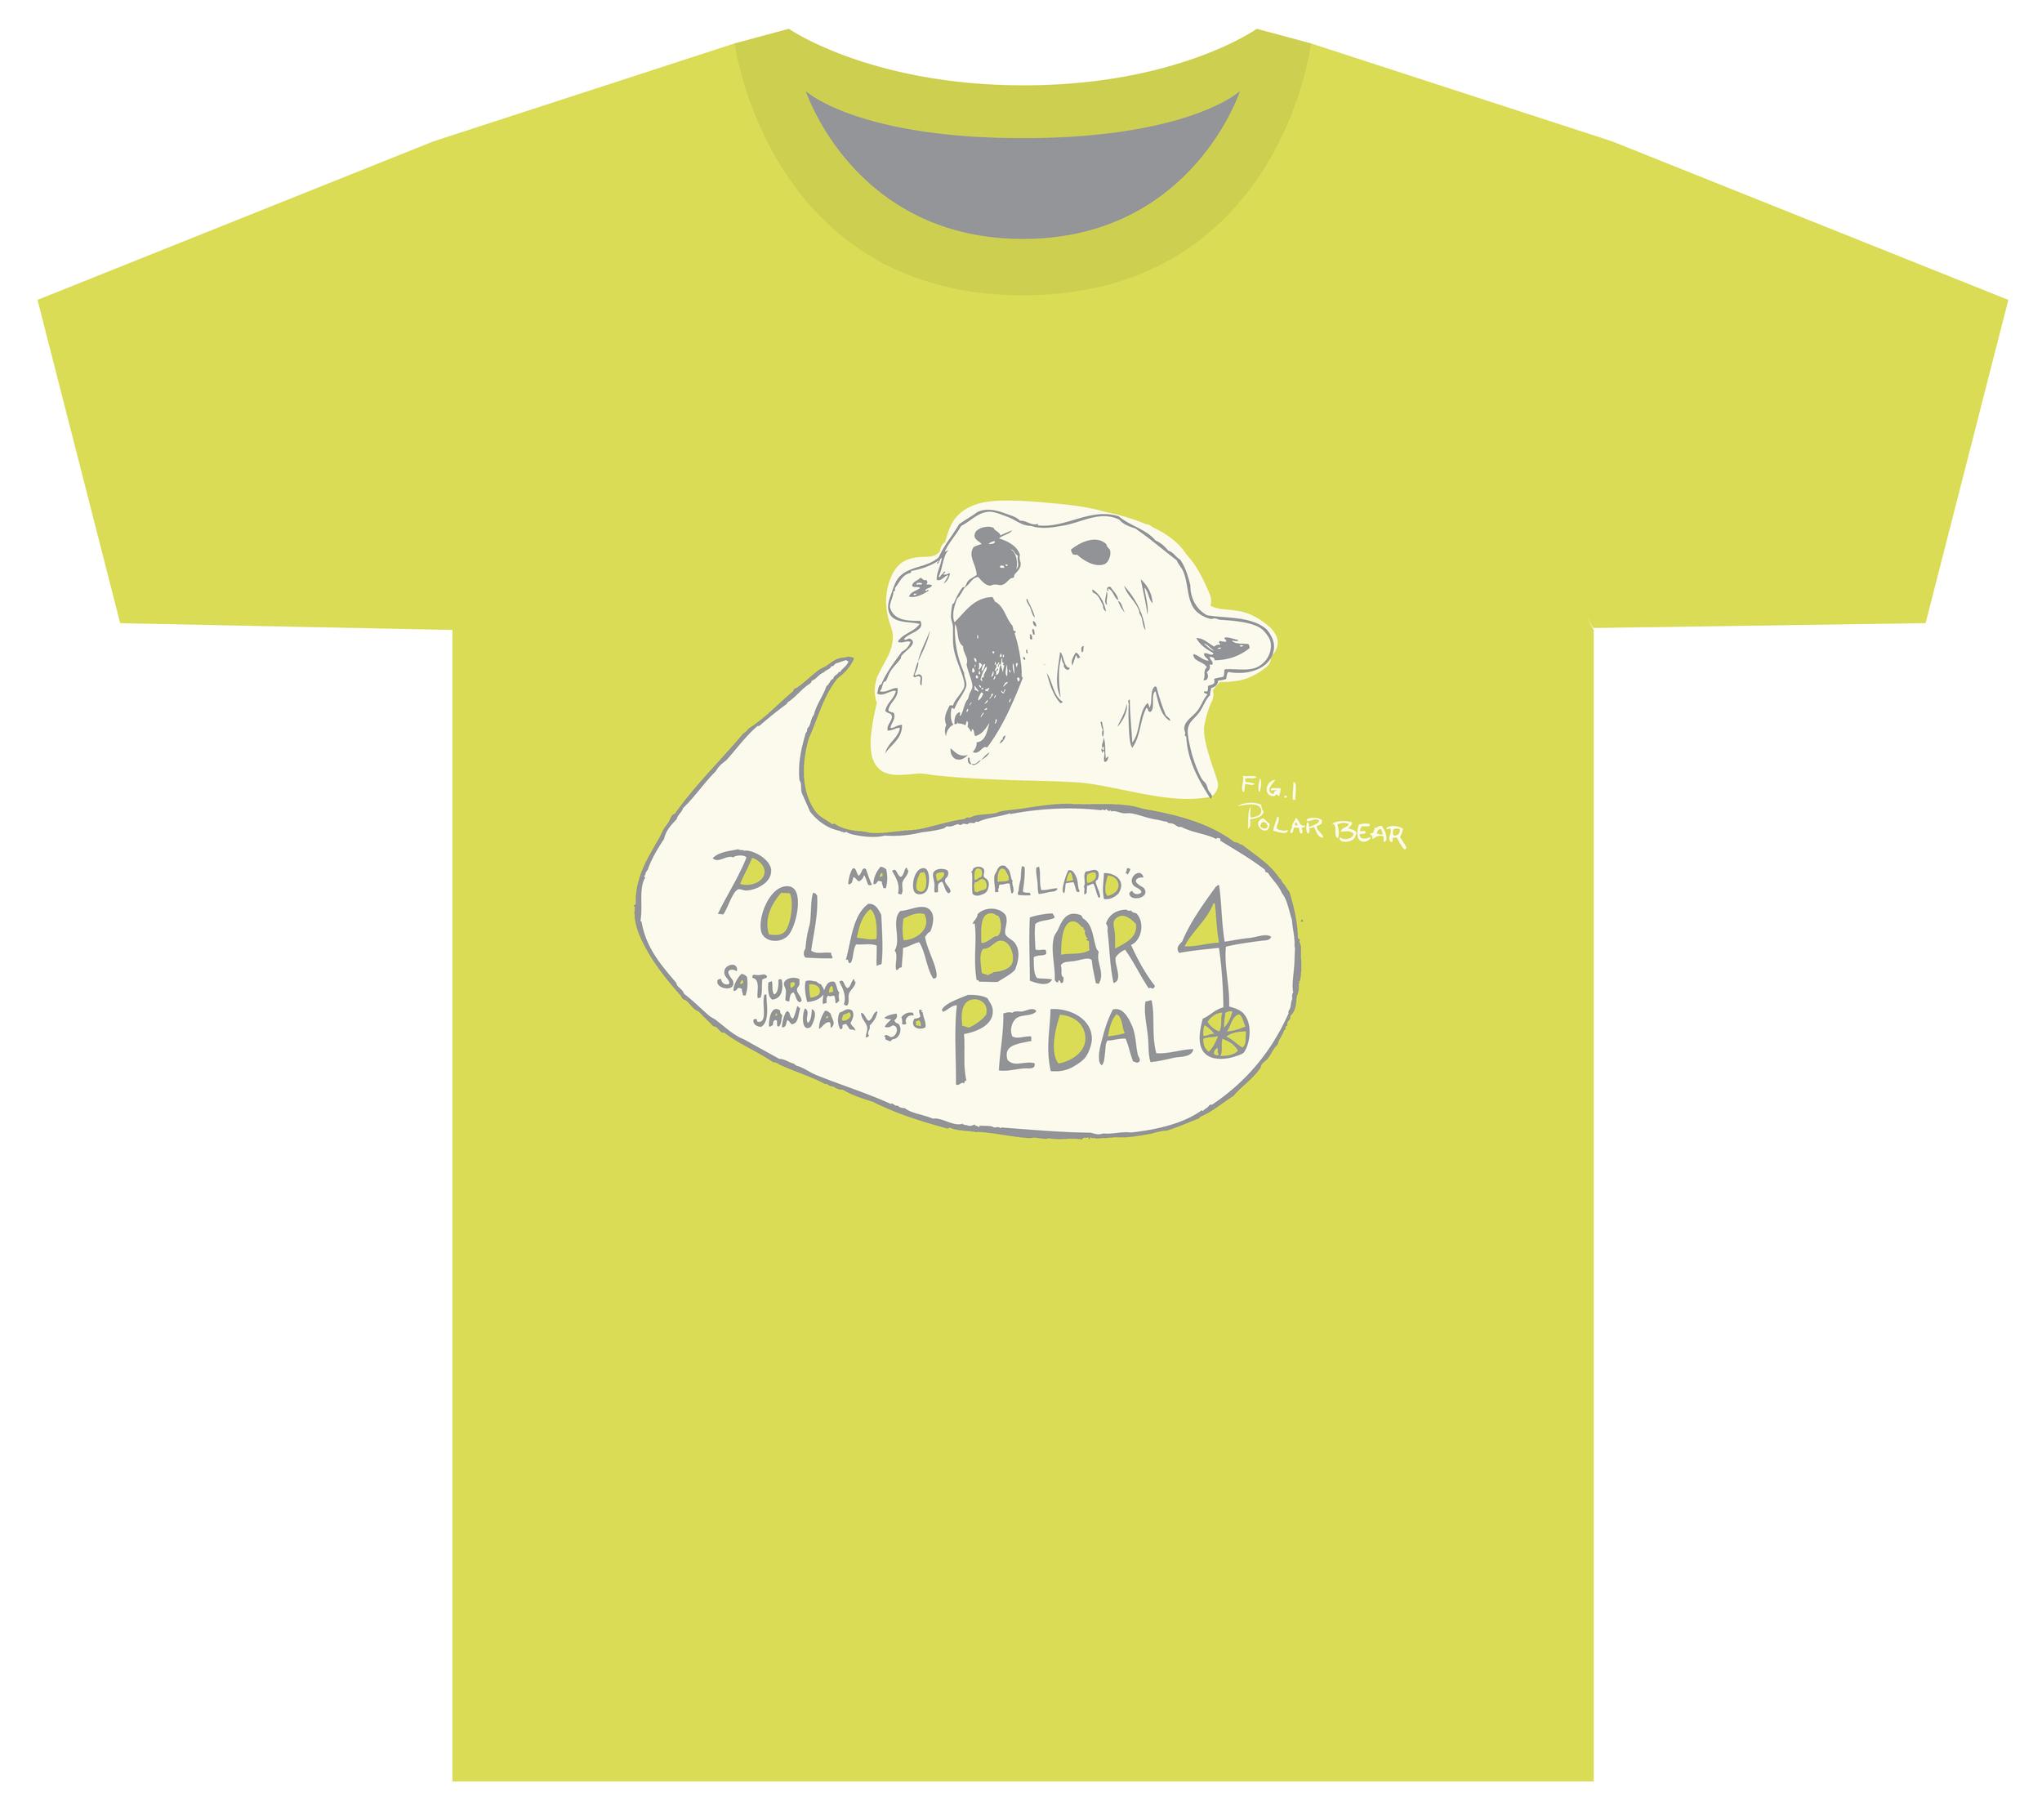 T-shirt design for Indianapolis's former Mayor Ballard's annual Polar Bear Pedal bike ride